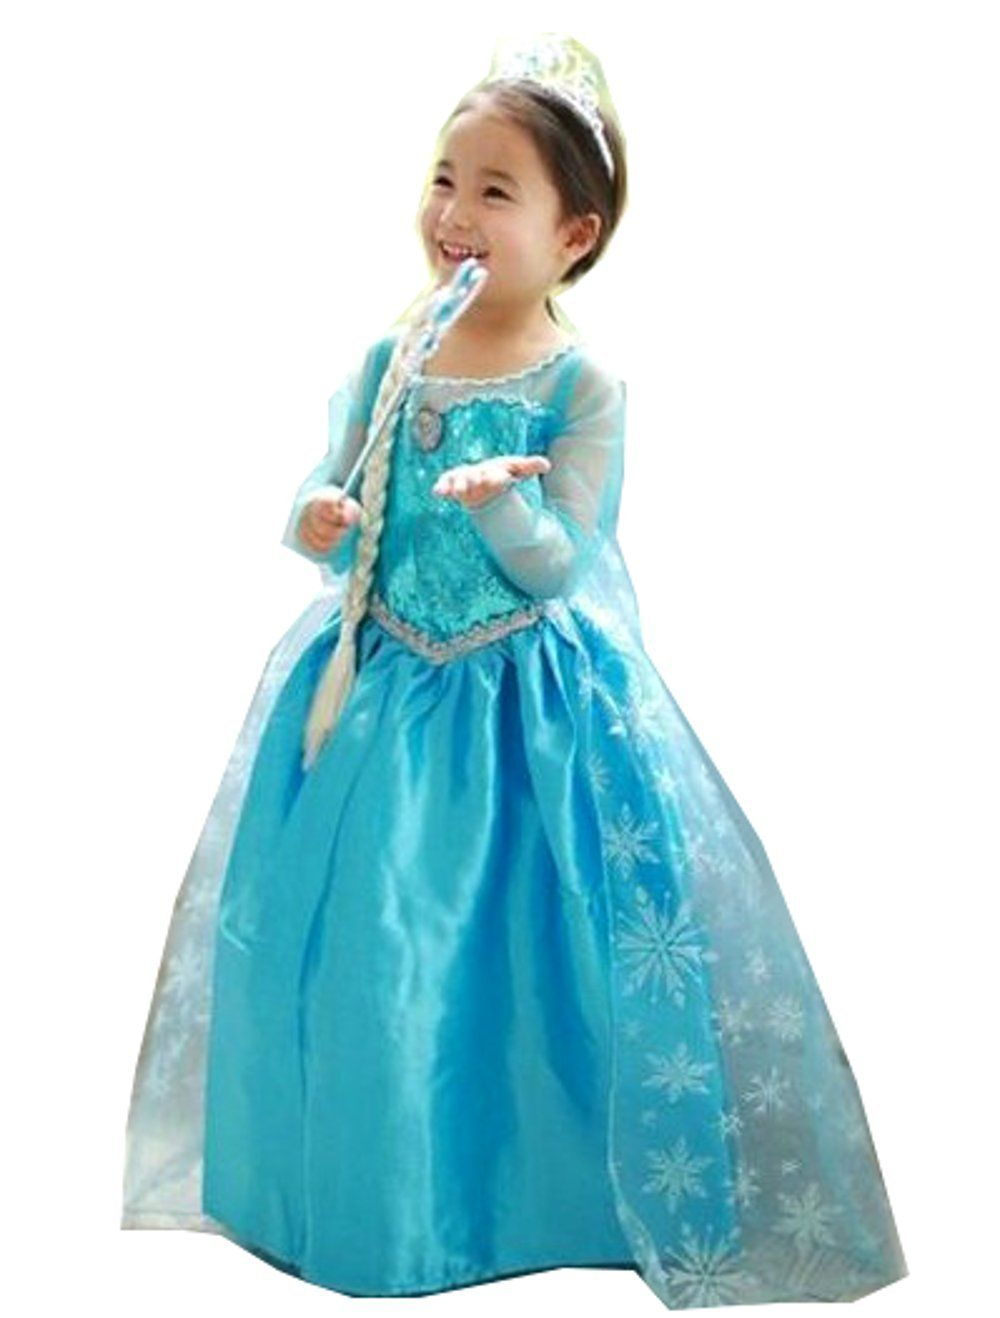 Amazon.com: Princess Inspired Girls Costume Dress - Princess Costume ...